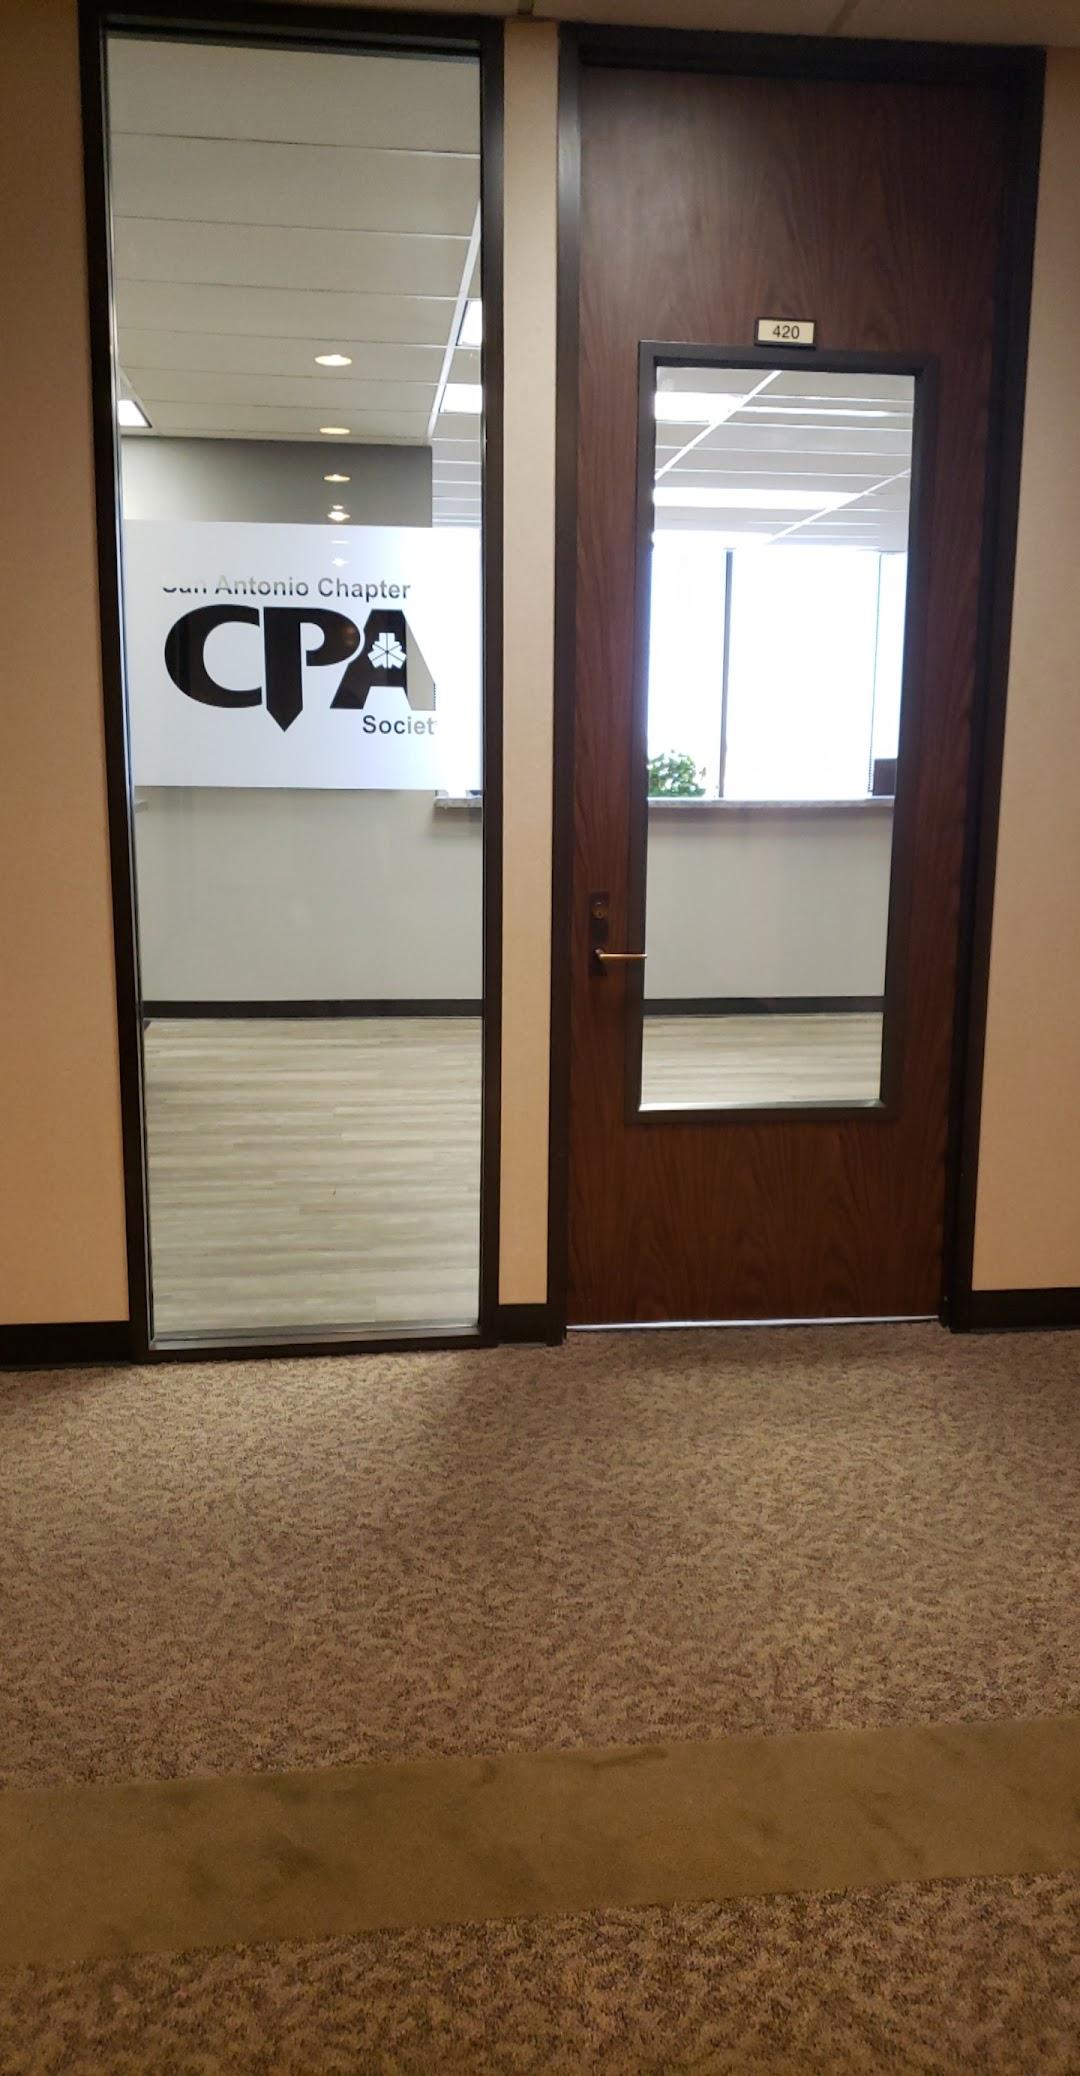 San Antonio CPA Society